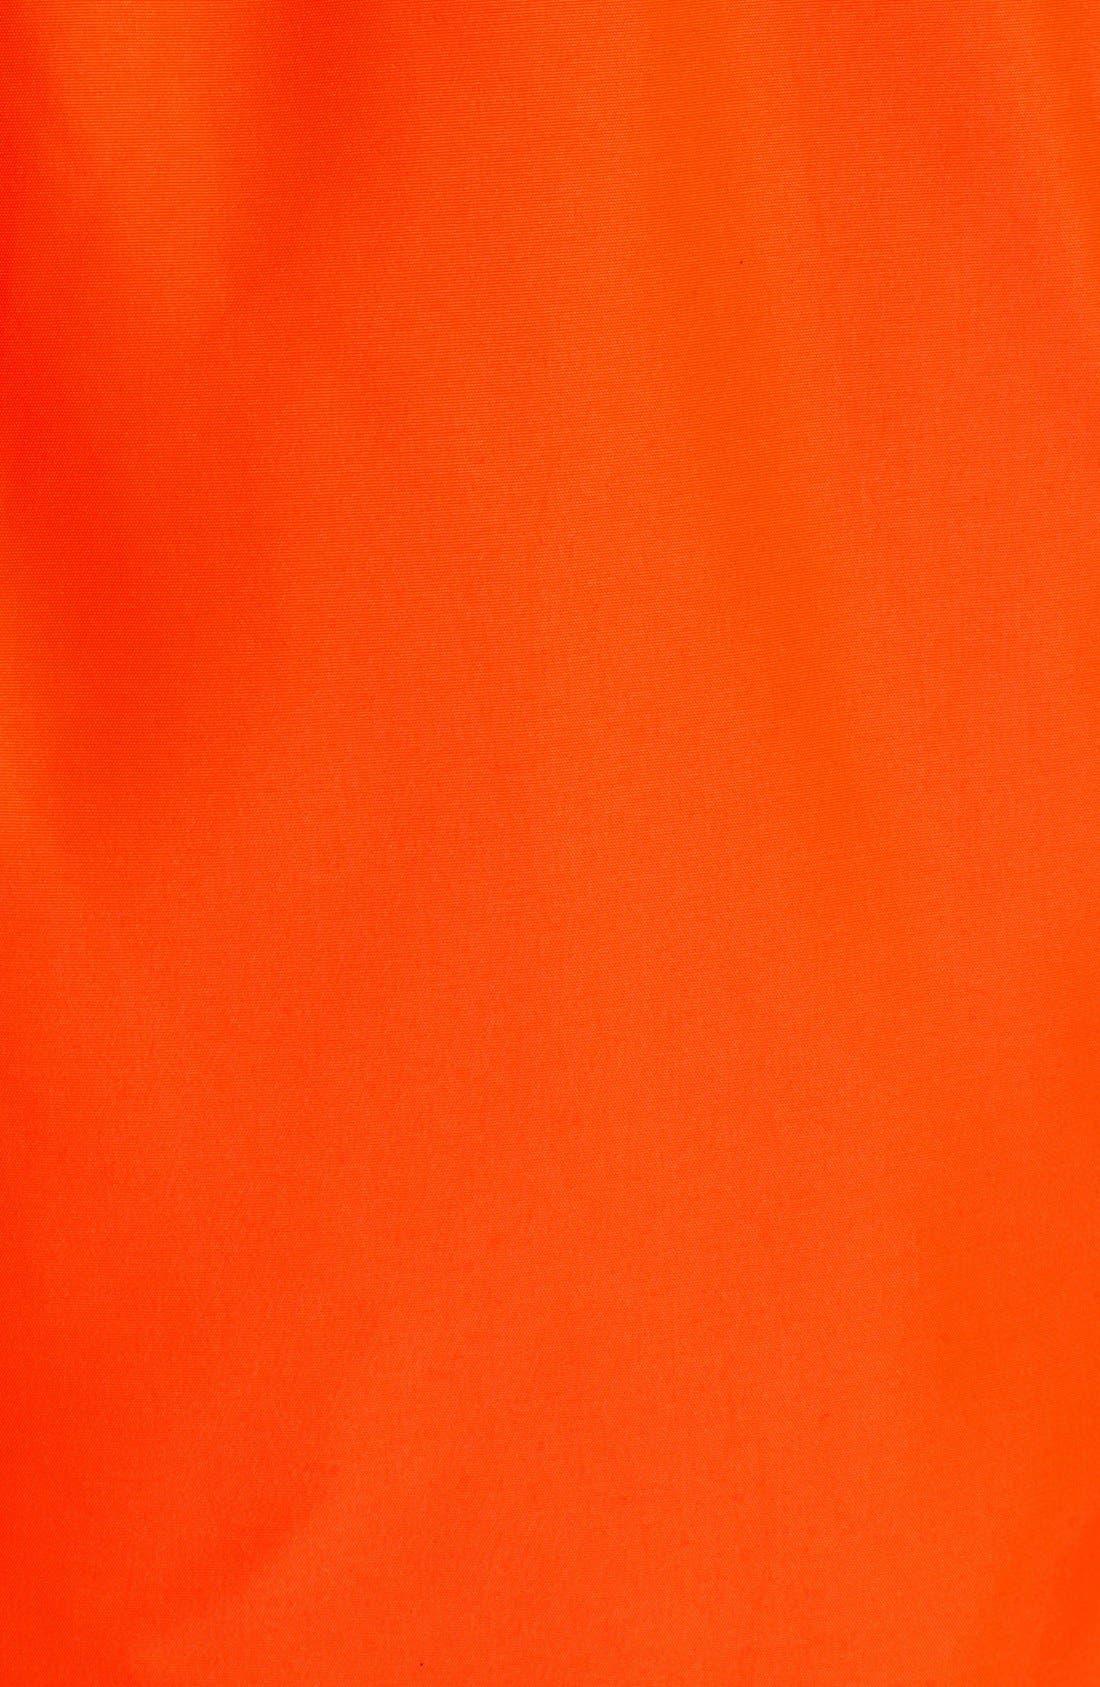 Alternate Image 3  - BOSS HUGO BOSS 'Innovation Starfish' Swim Trunks